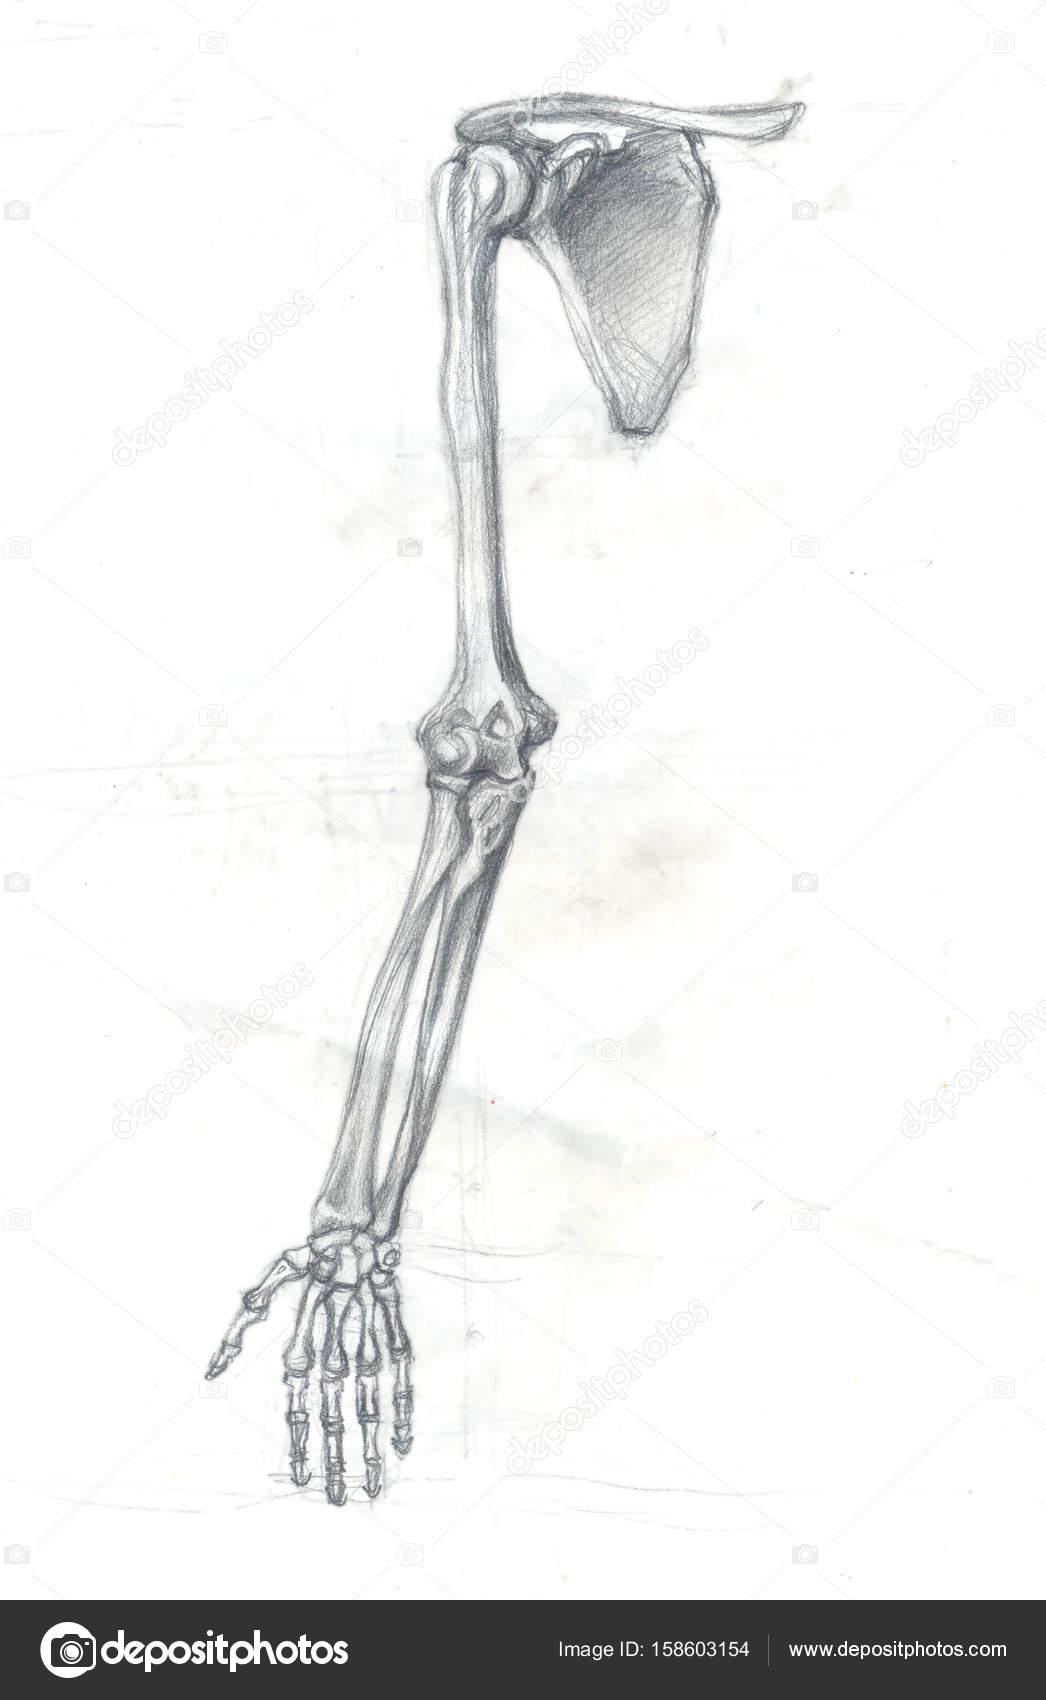 Knochen des Arms — Stockfoto © richcat #158603154